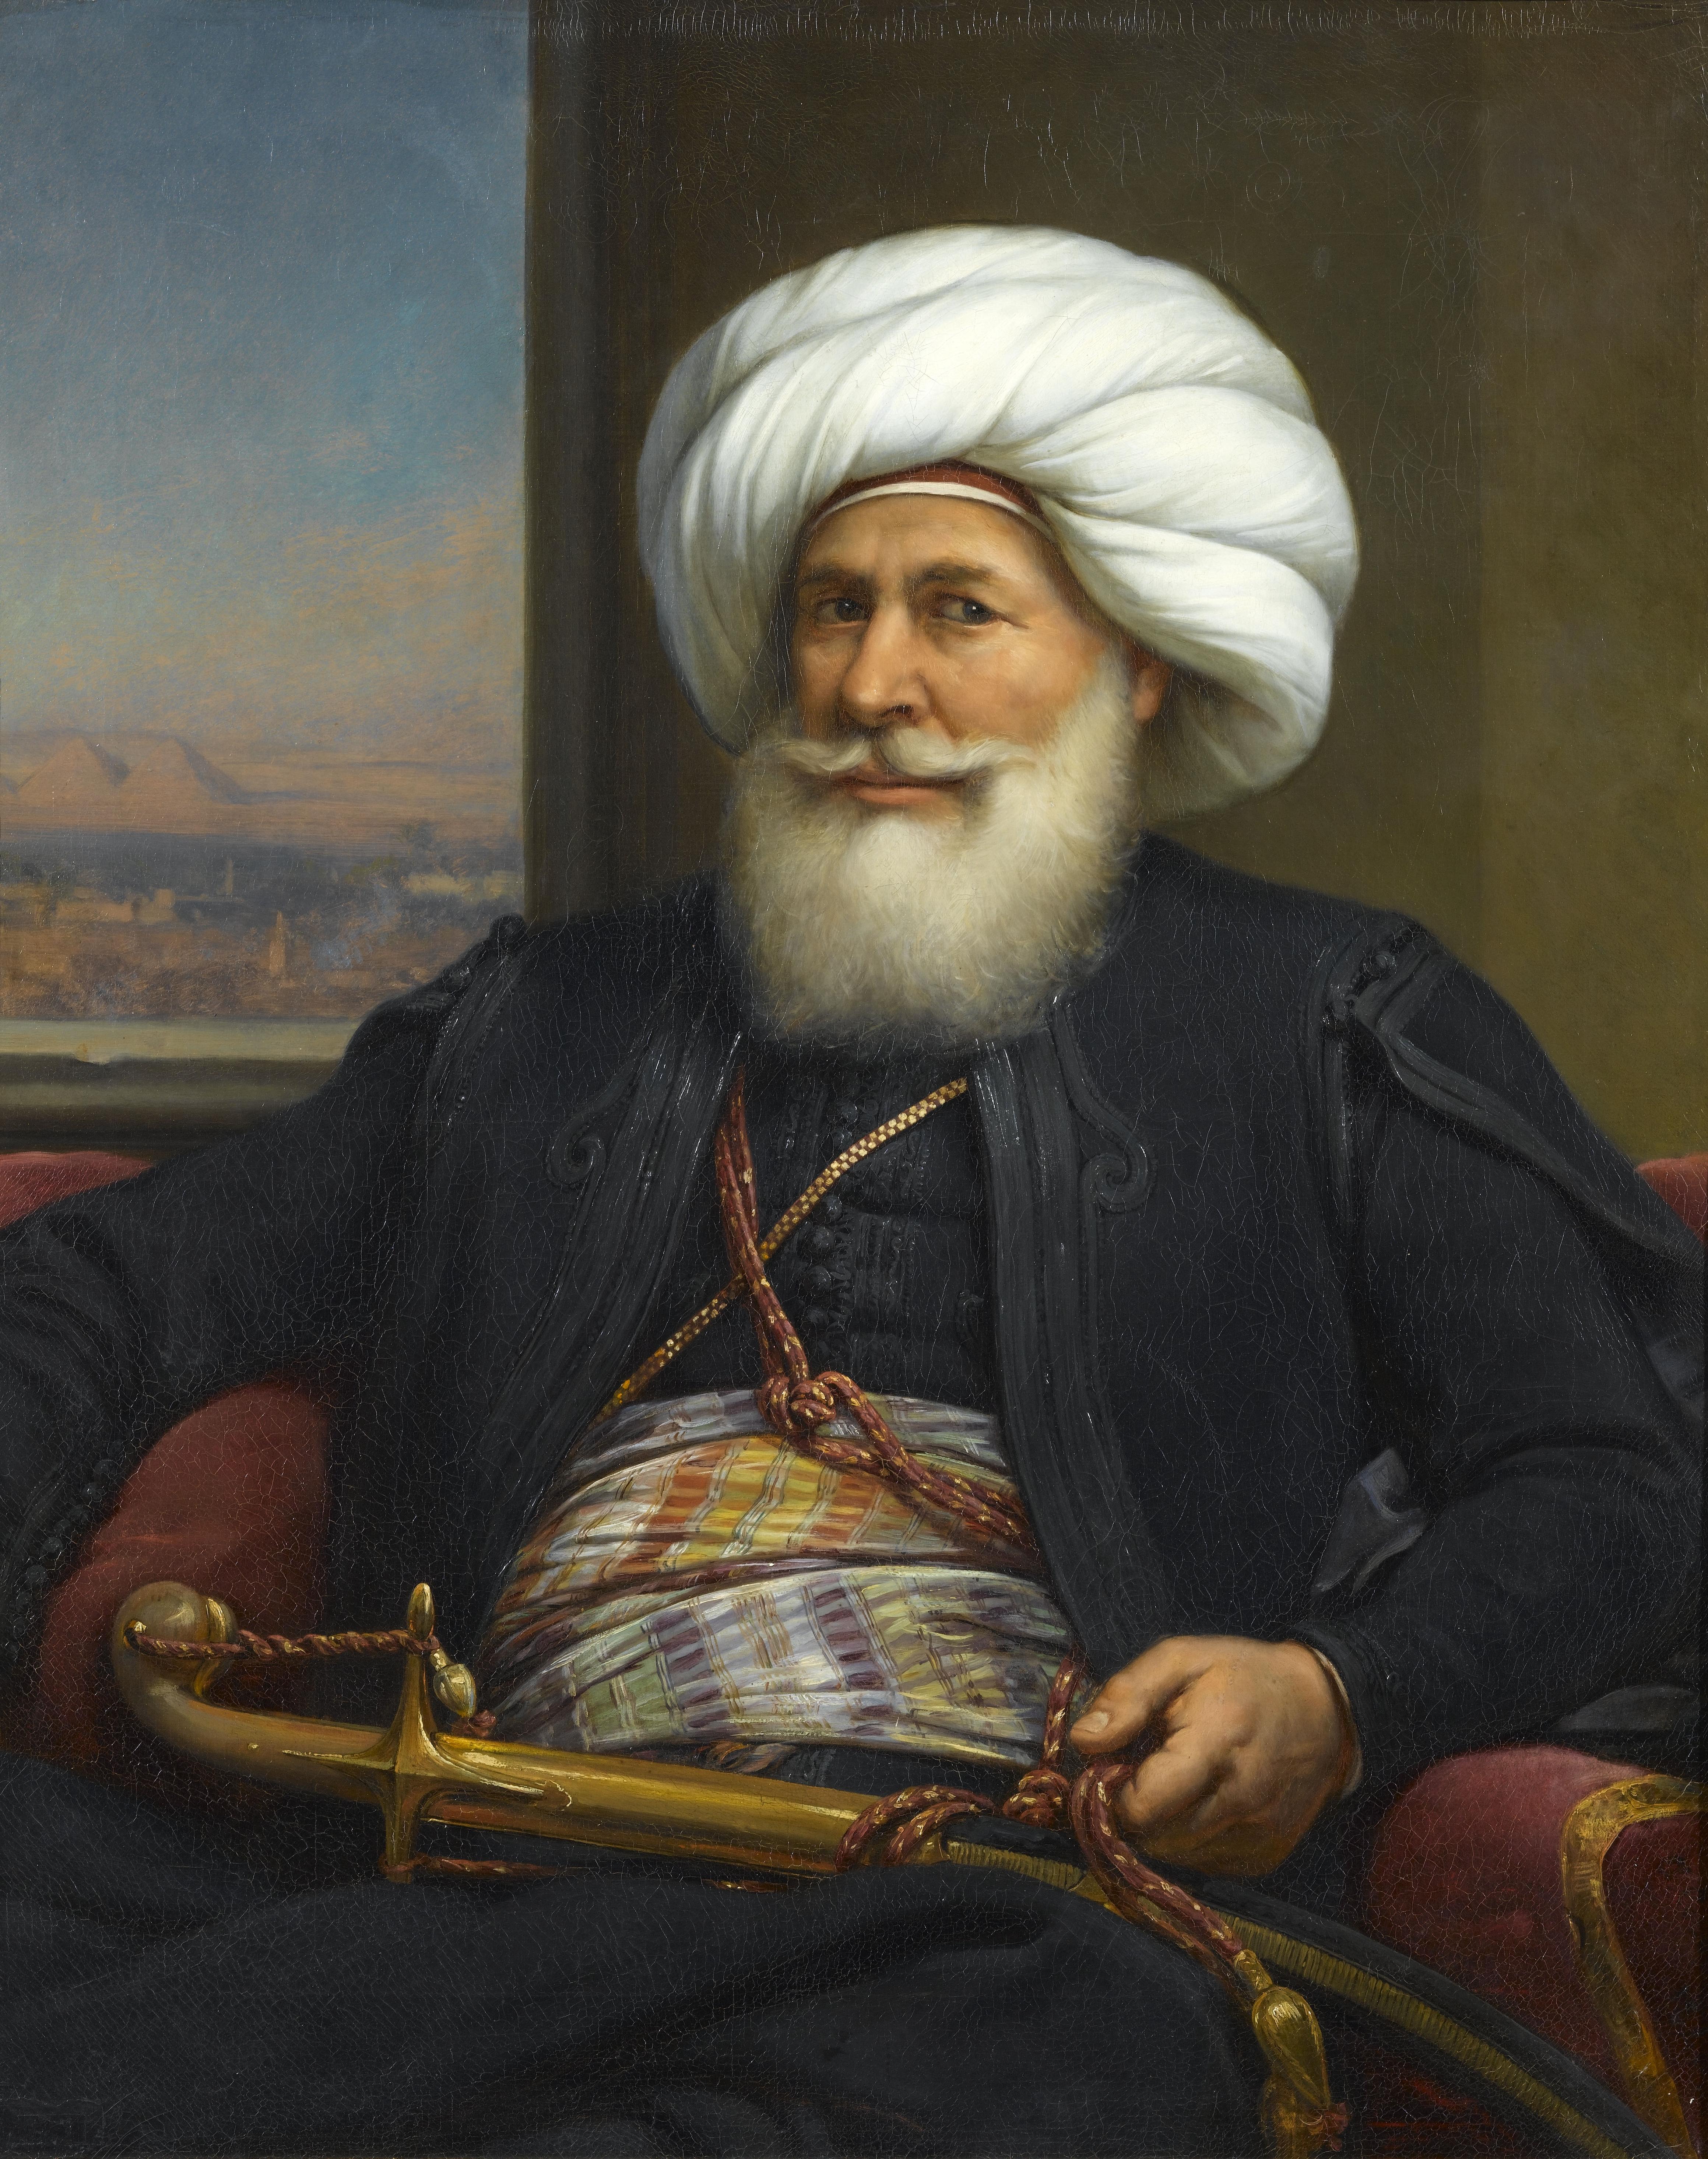 File:Modernegypt, muhammad ali by auguste couder, bap 17996.jpg